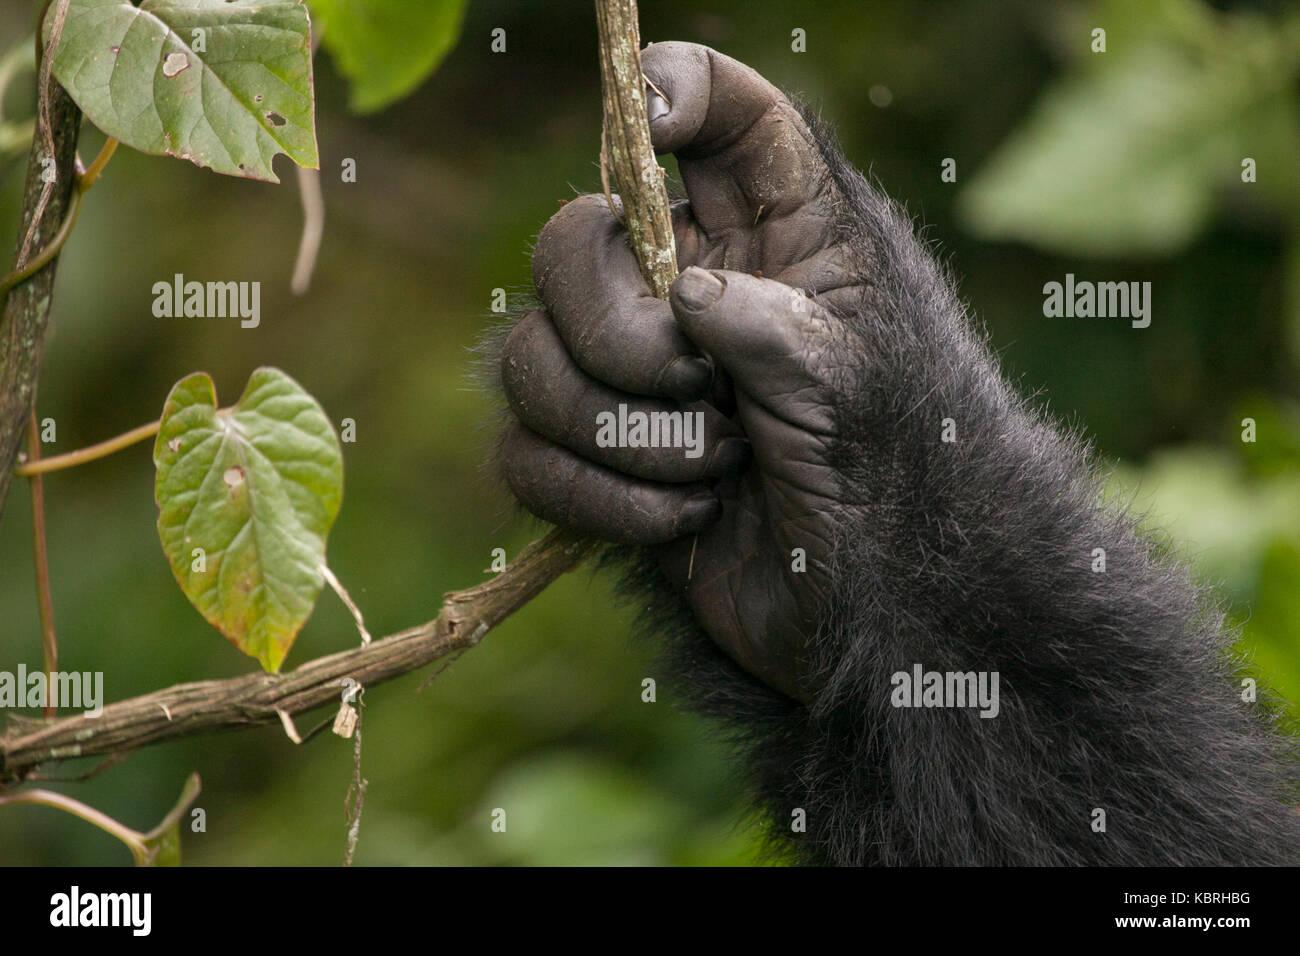 Mountain Gorilla im Dschungel von Ruanda. Volcanoes National Park. Stockfoto